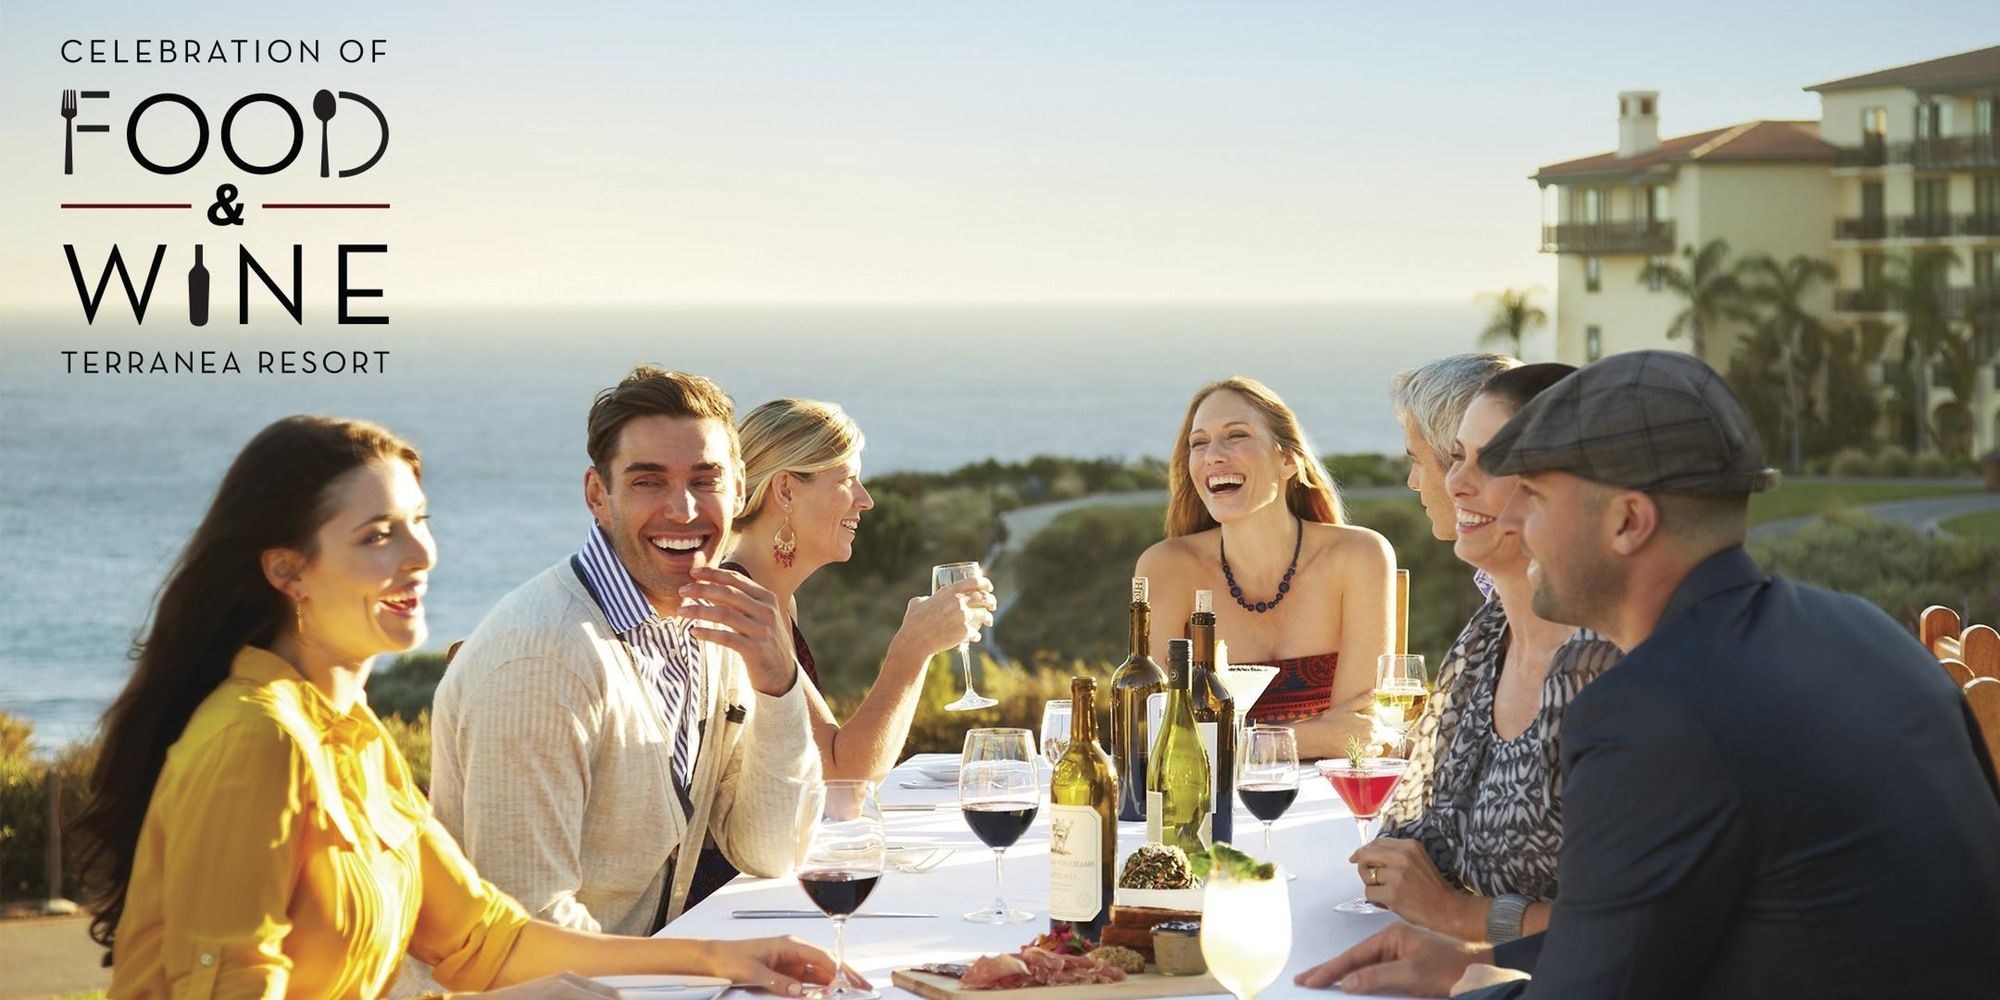 Celebration of Food & Wine Terranea Terranea resort